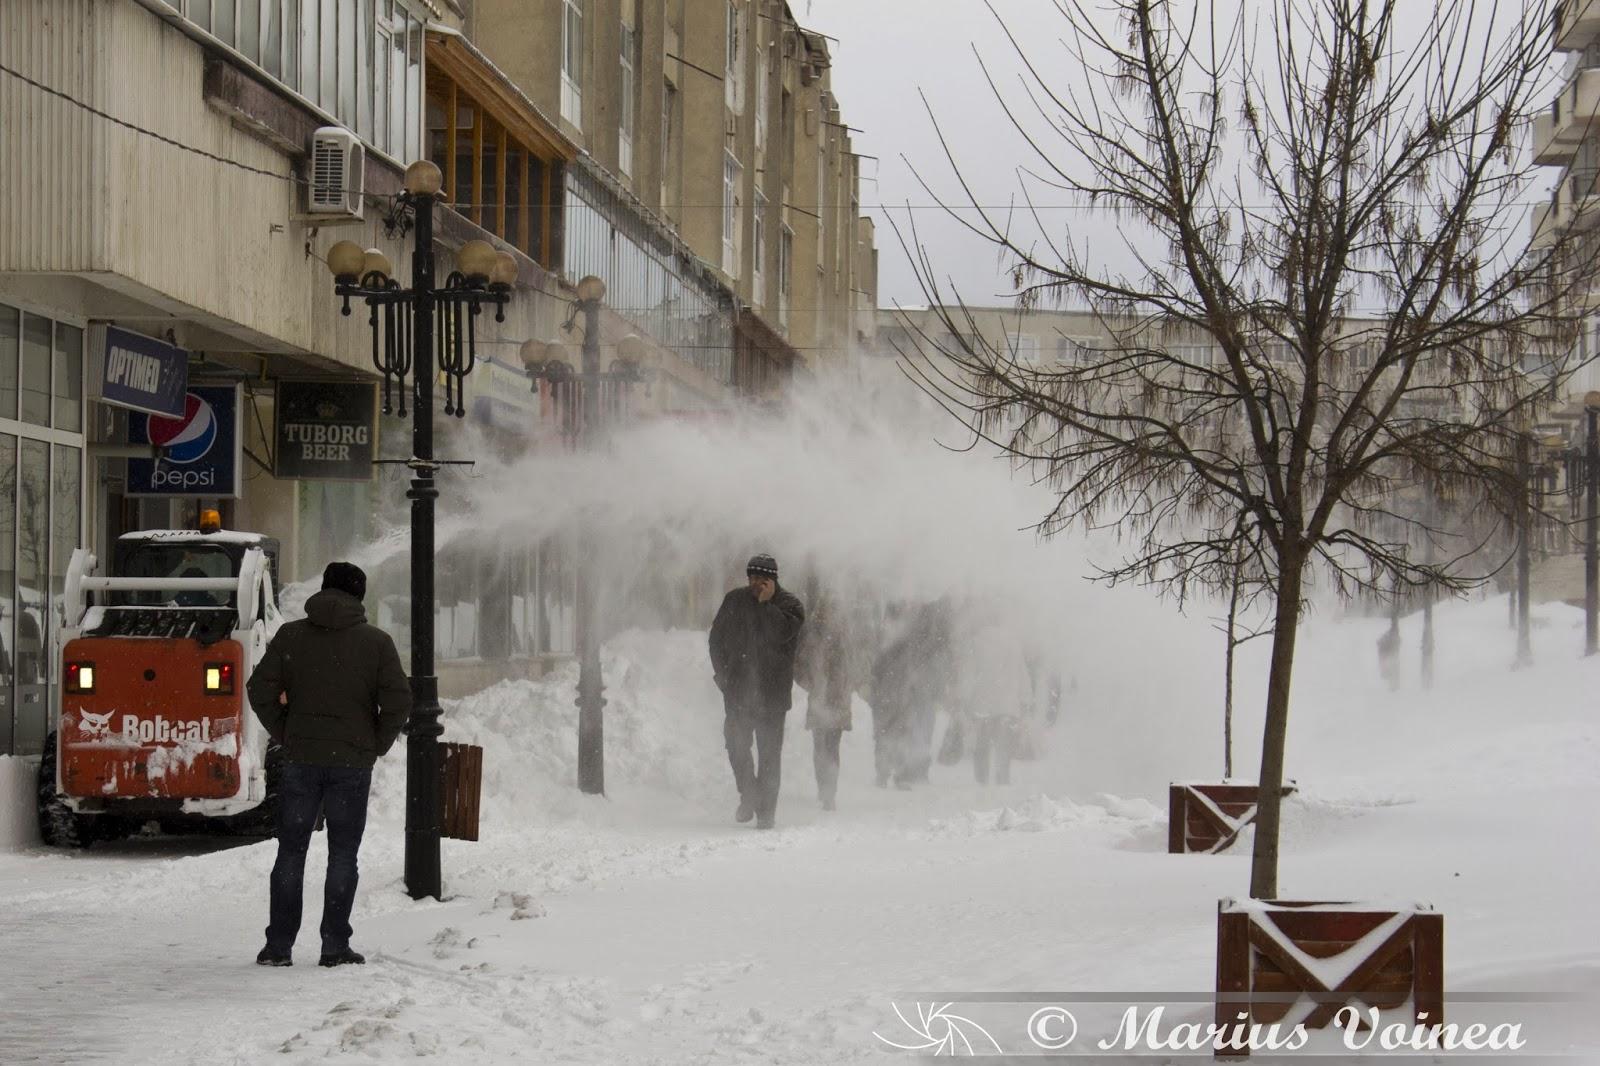 iarna la ramnicu sarat, 2014 foto 9